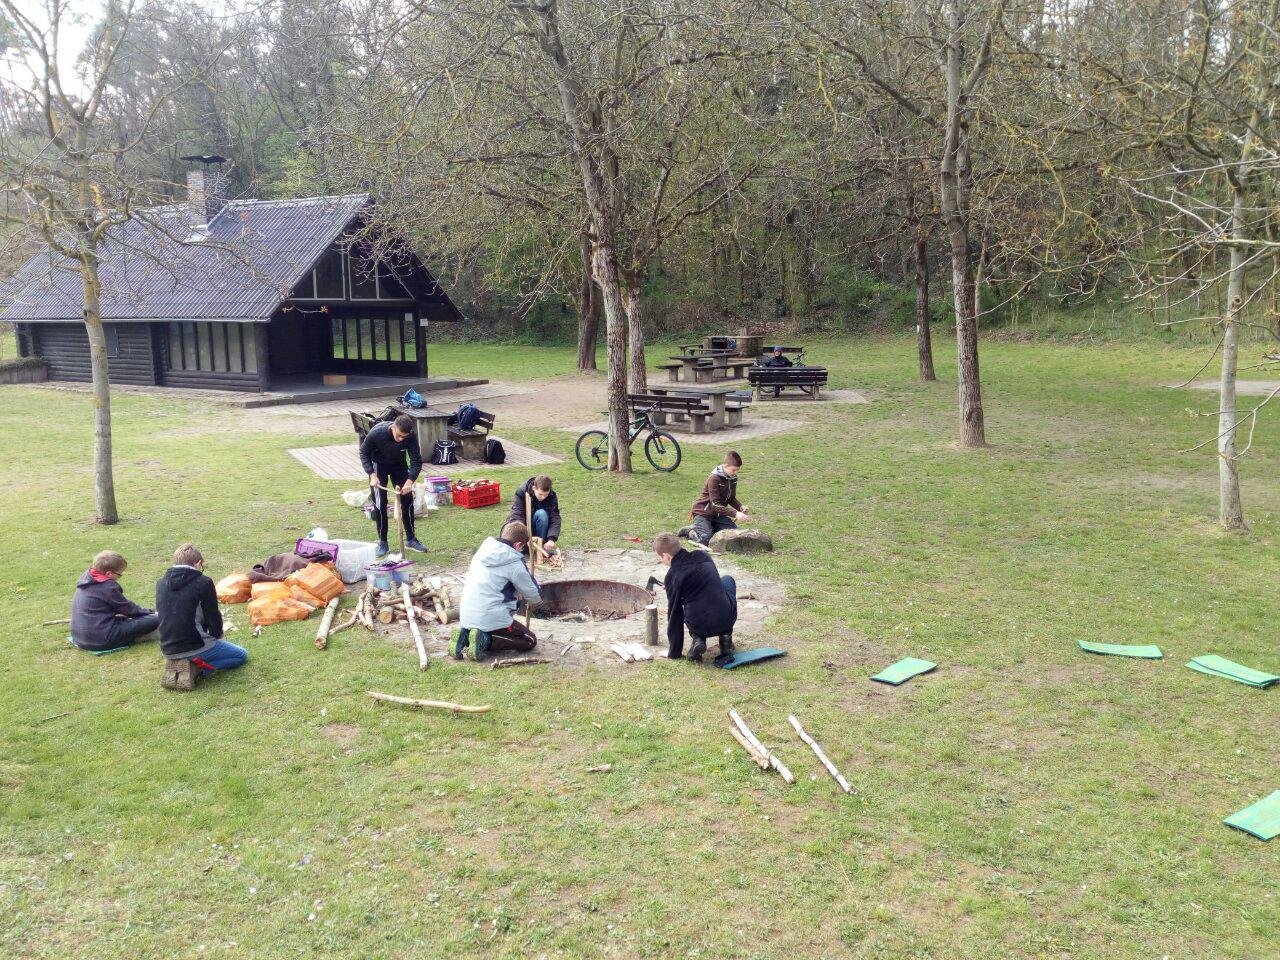 Jungs Bushcrafter an der Grillhütte Oftersheim. (April)